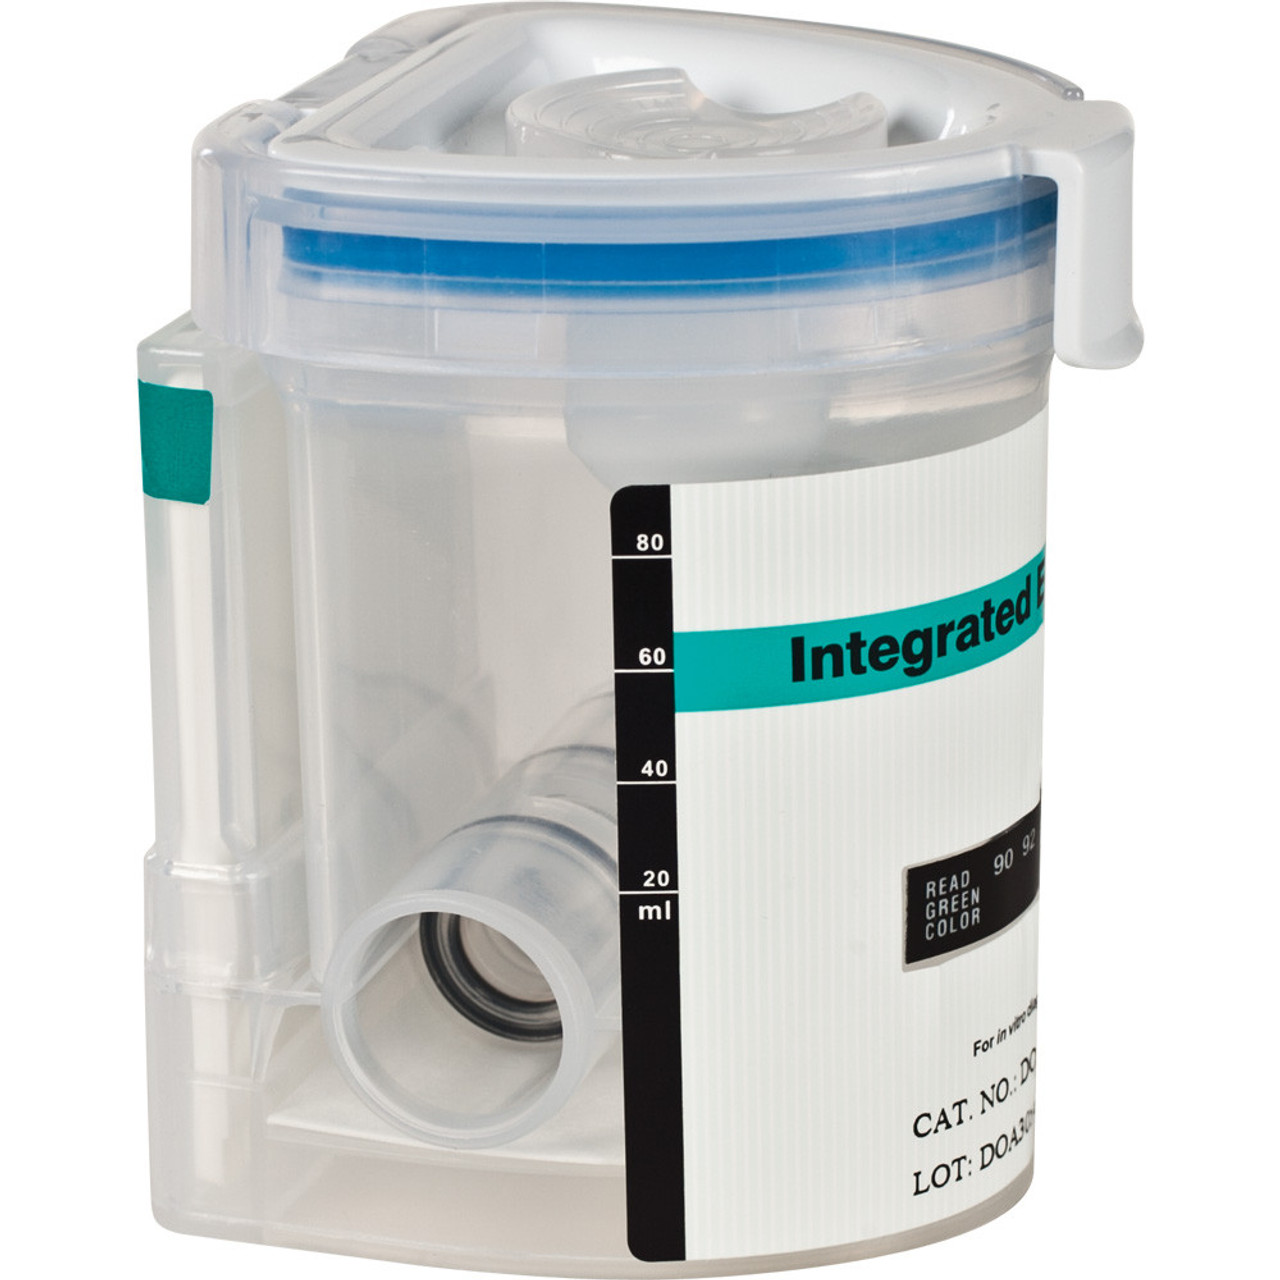 EZ Split Integrated Key Cup Drug Test Abbott Alere All-in-one Rapid